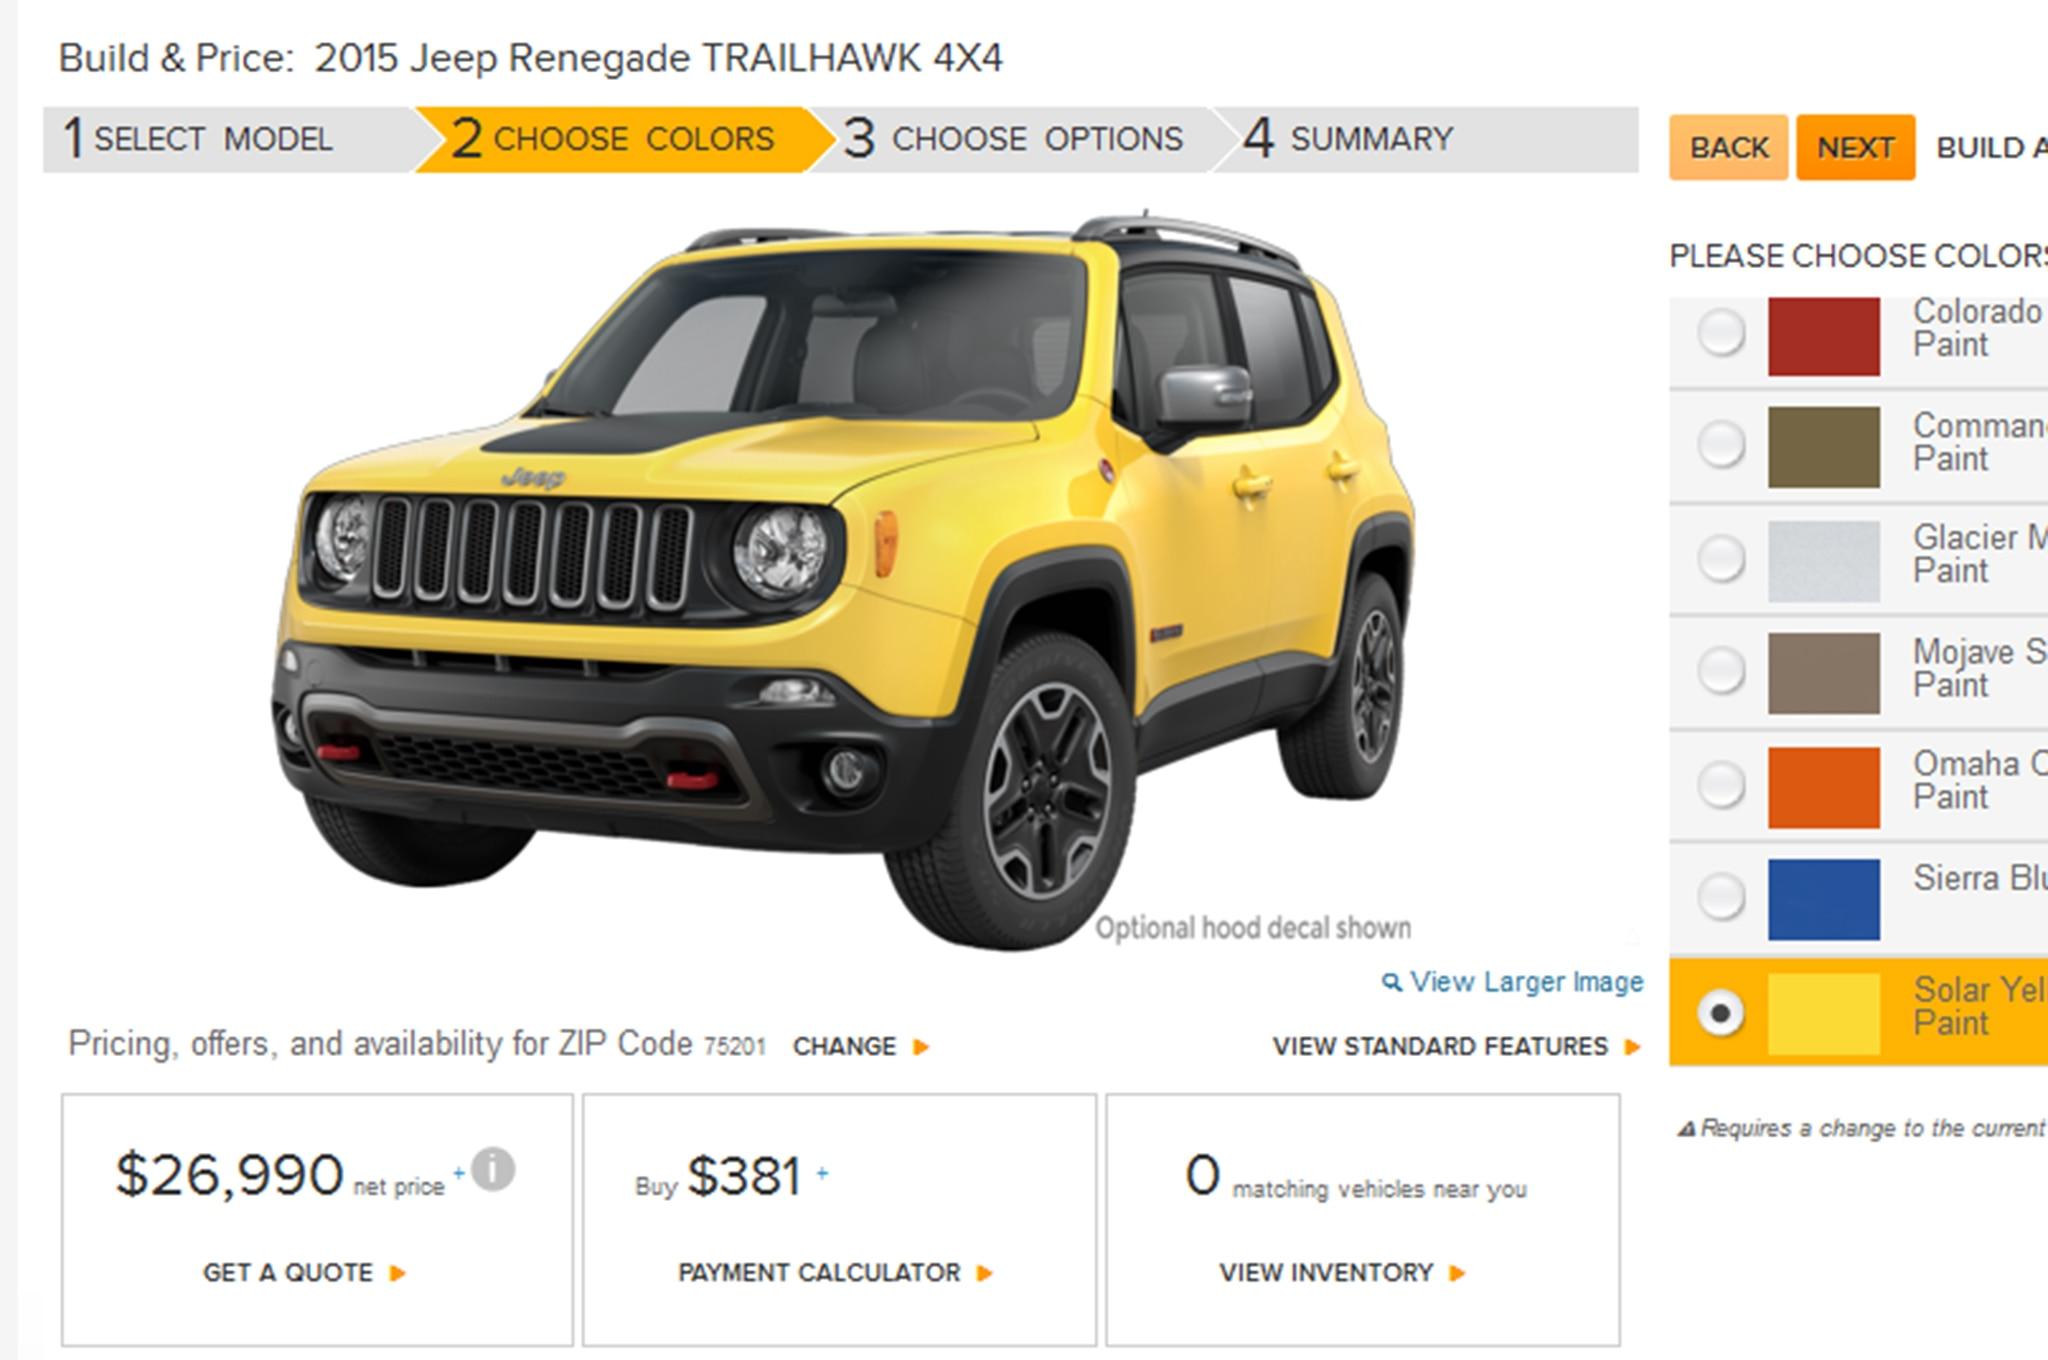 2015 Jeep Renegade Configurator Goes Live